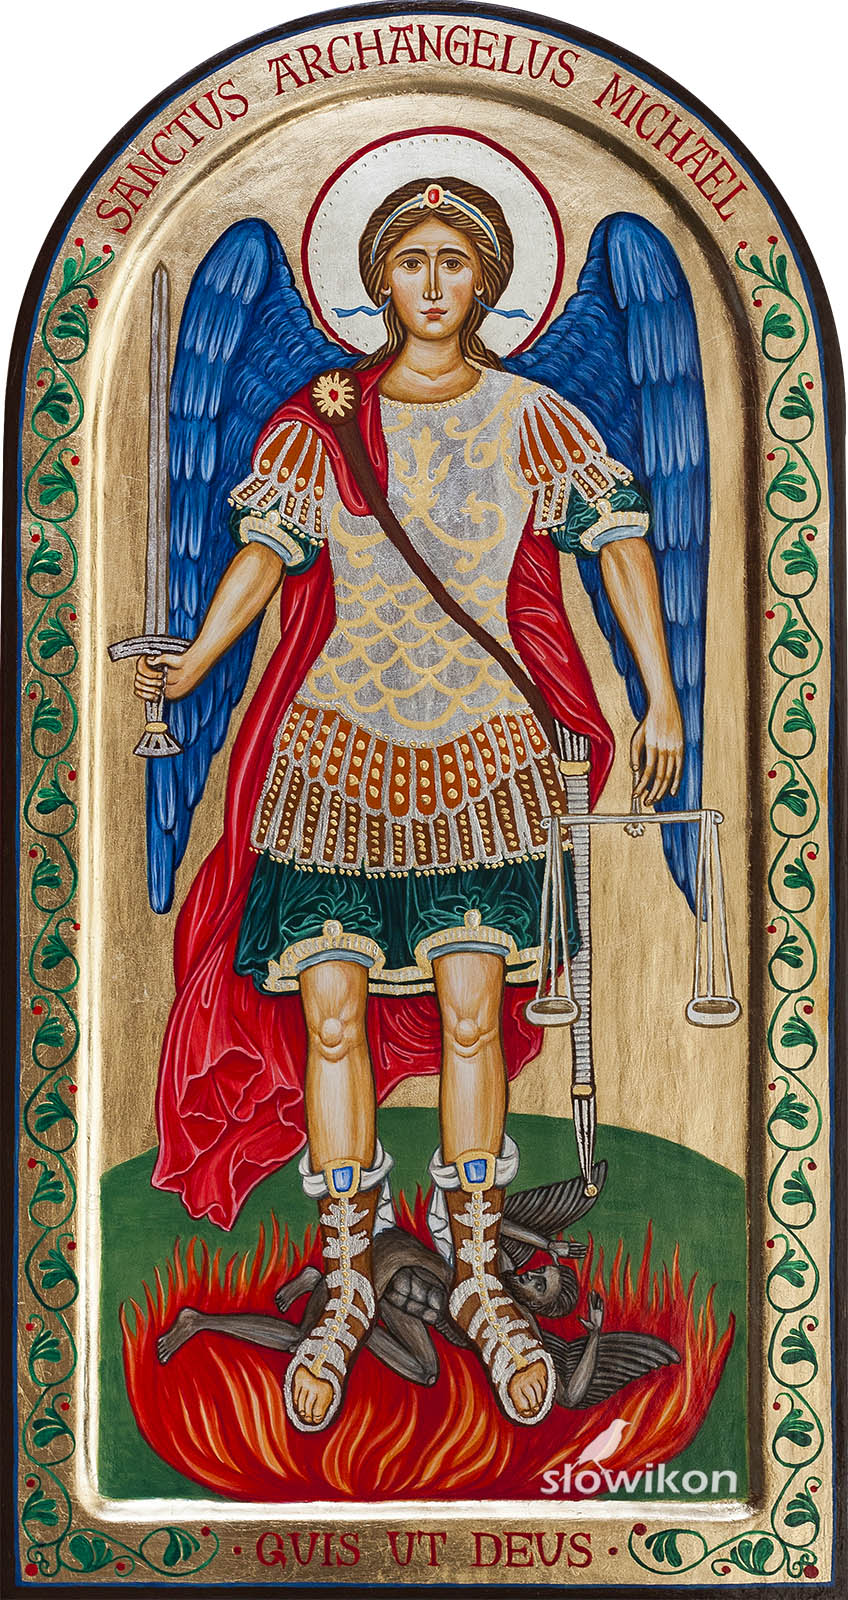 Archanioł Michał - Quist Ut Deus